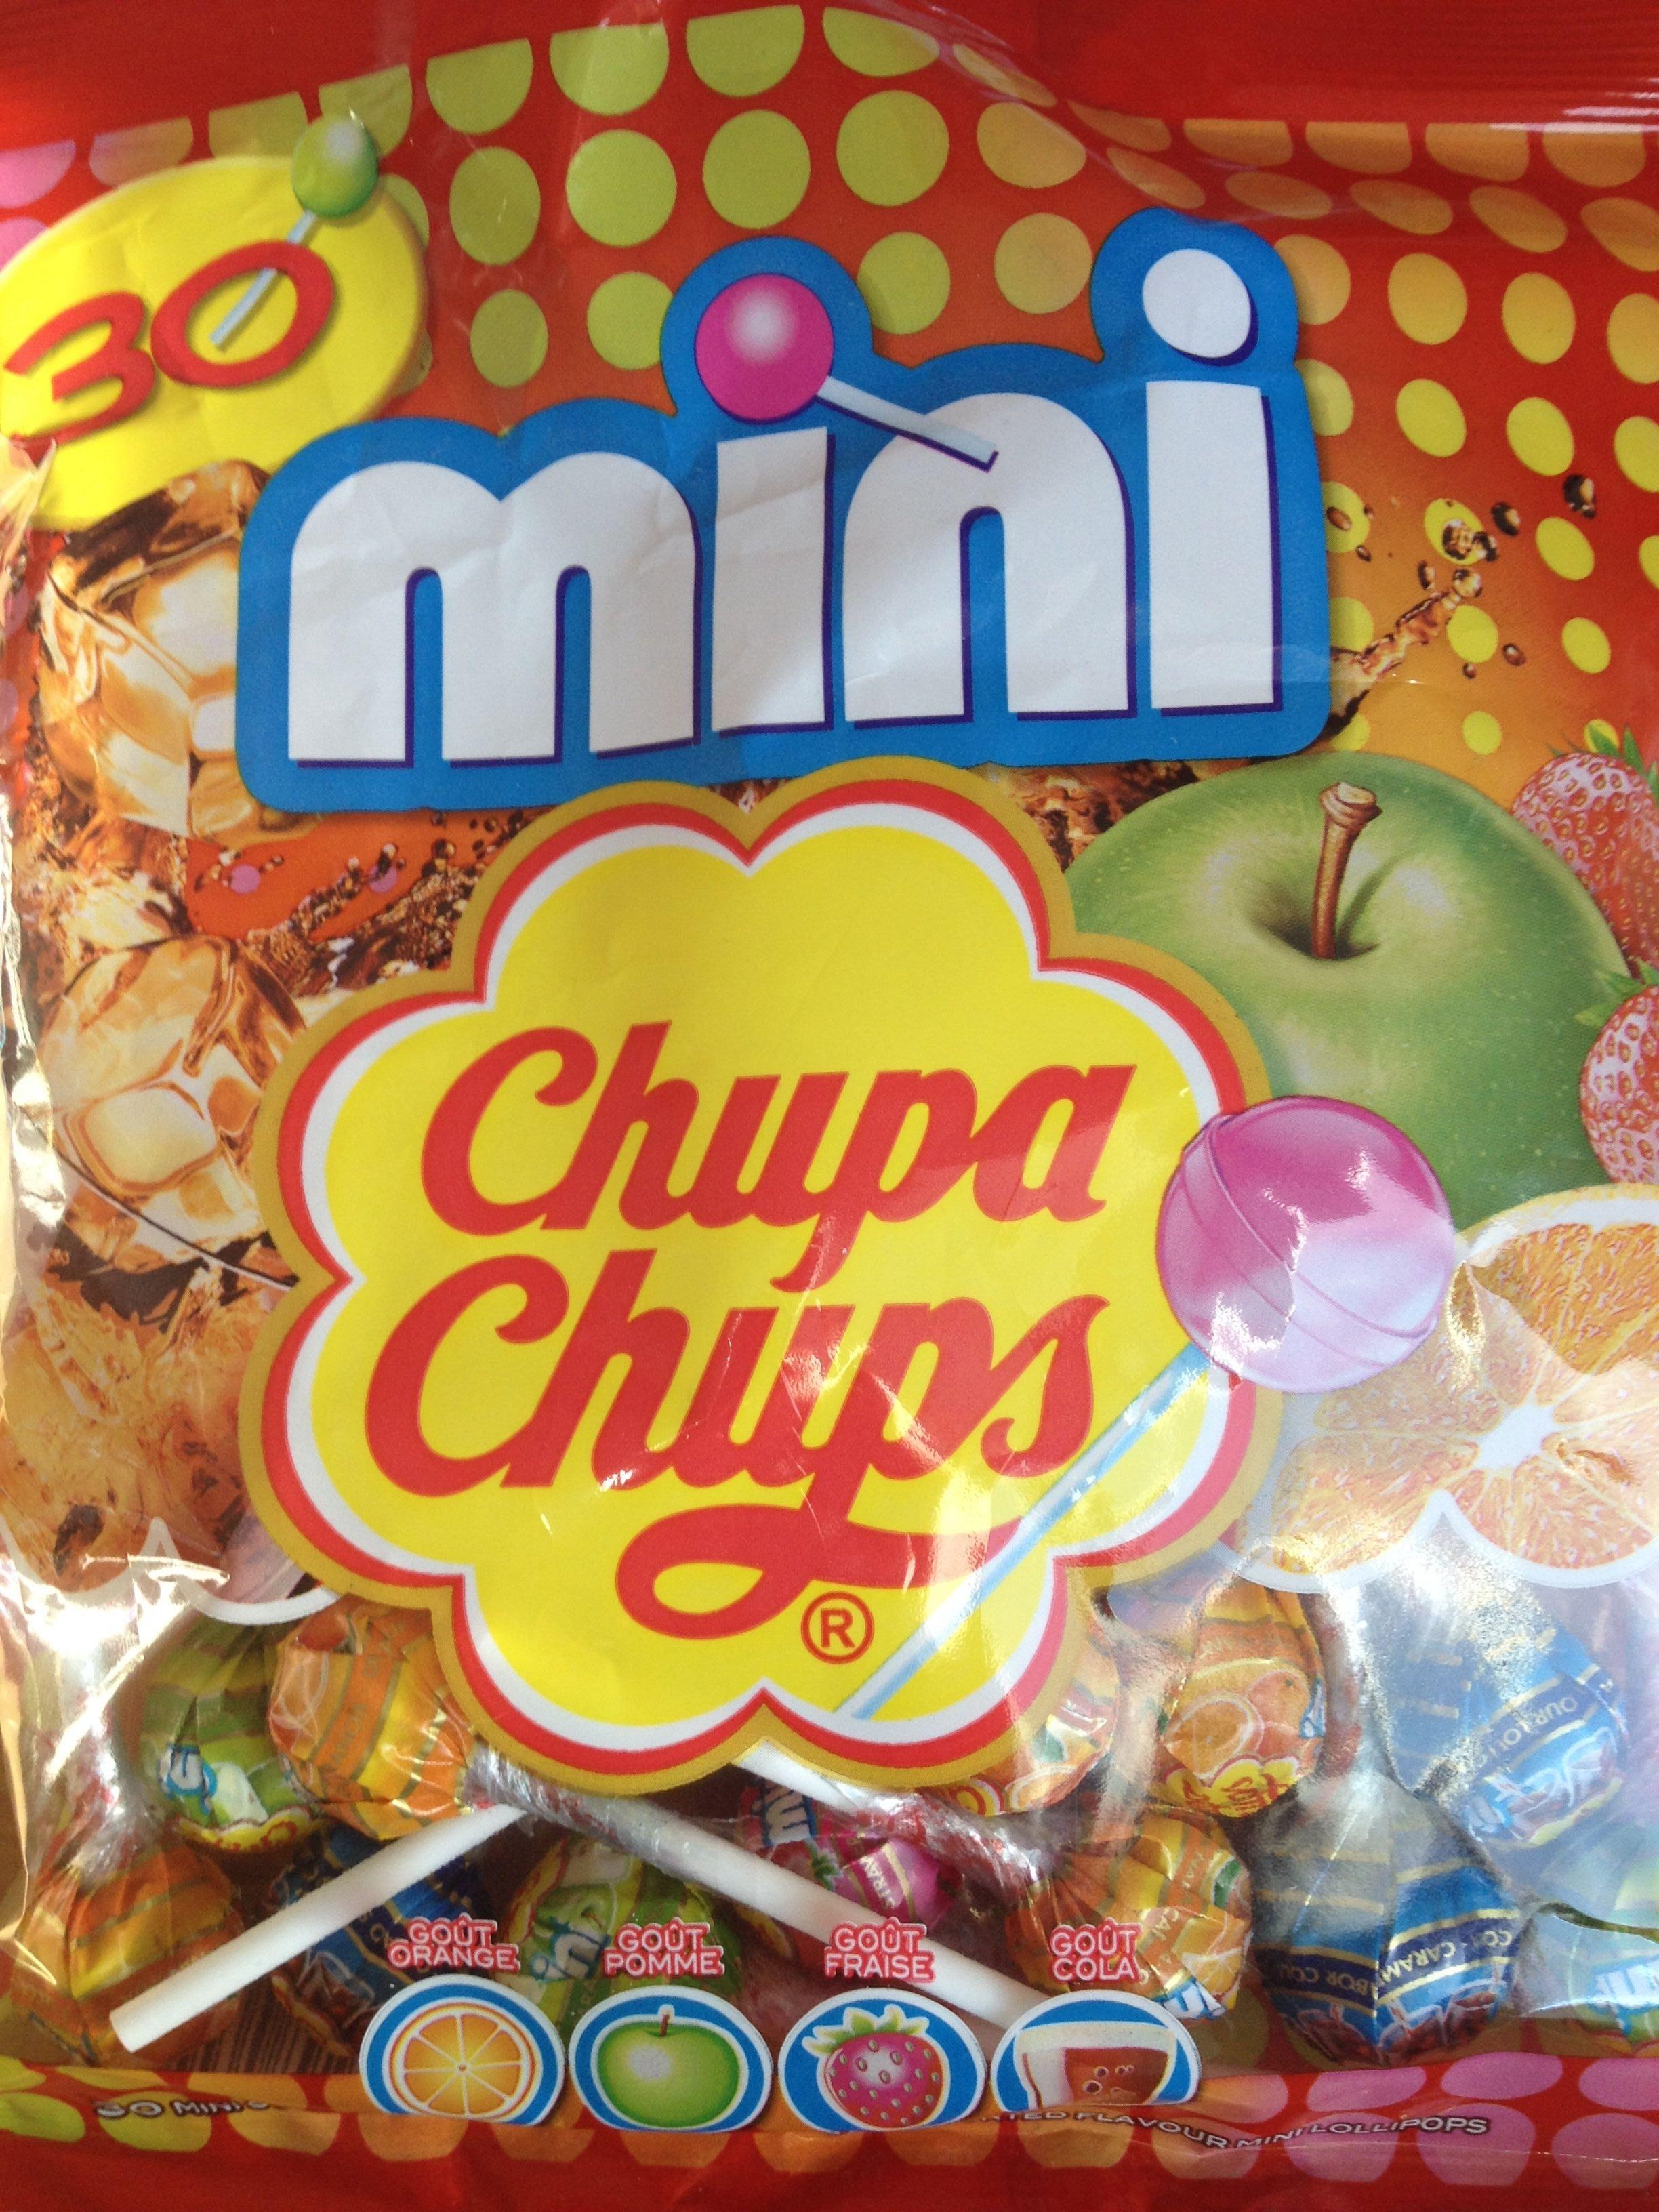 Mini chupa chups - Product